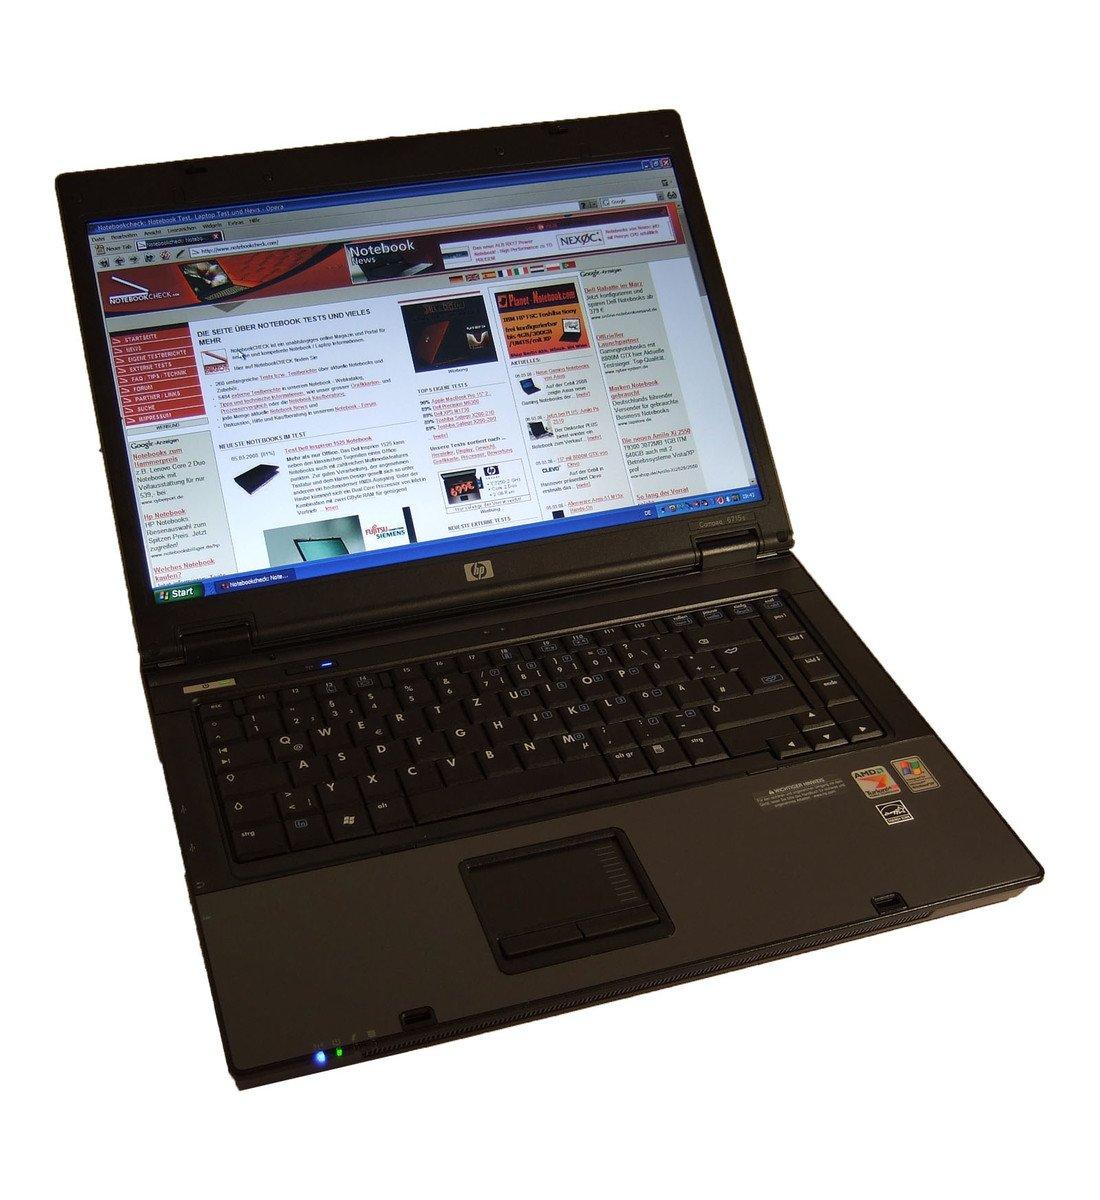 HP Compaq 6715b Notebook LAN Download Drivers